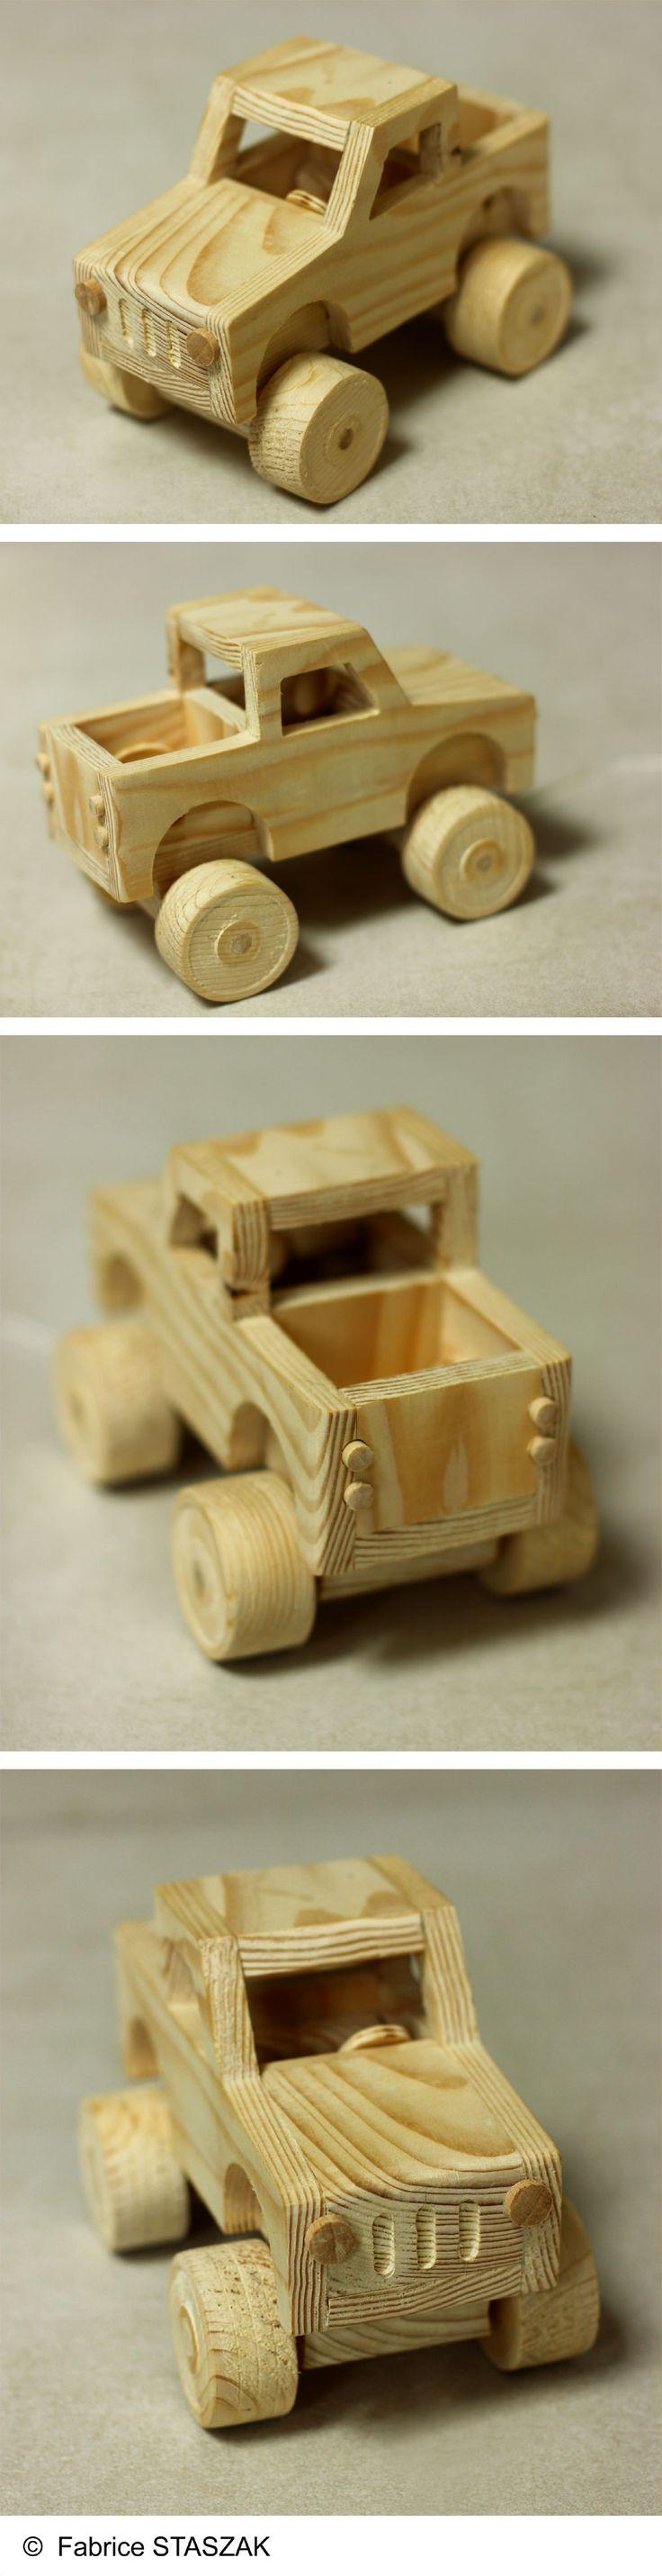 Big Wheel Truck. Wood toy. Car toy. Voiture jouet en bois. #BigWheelTruck #…